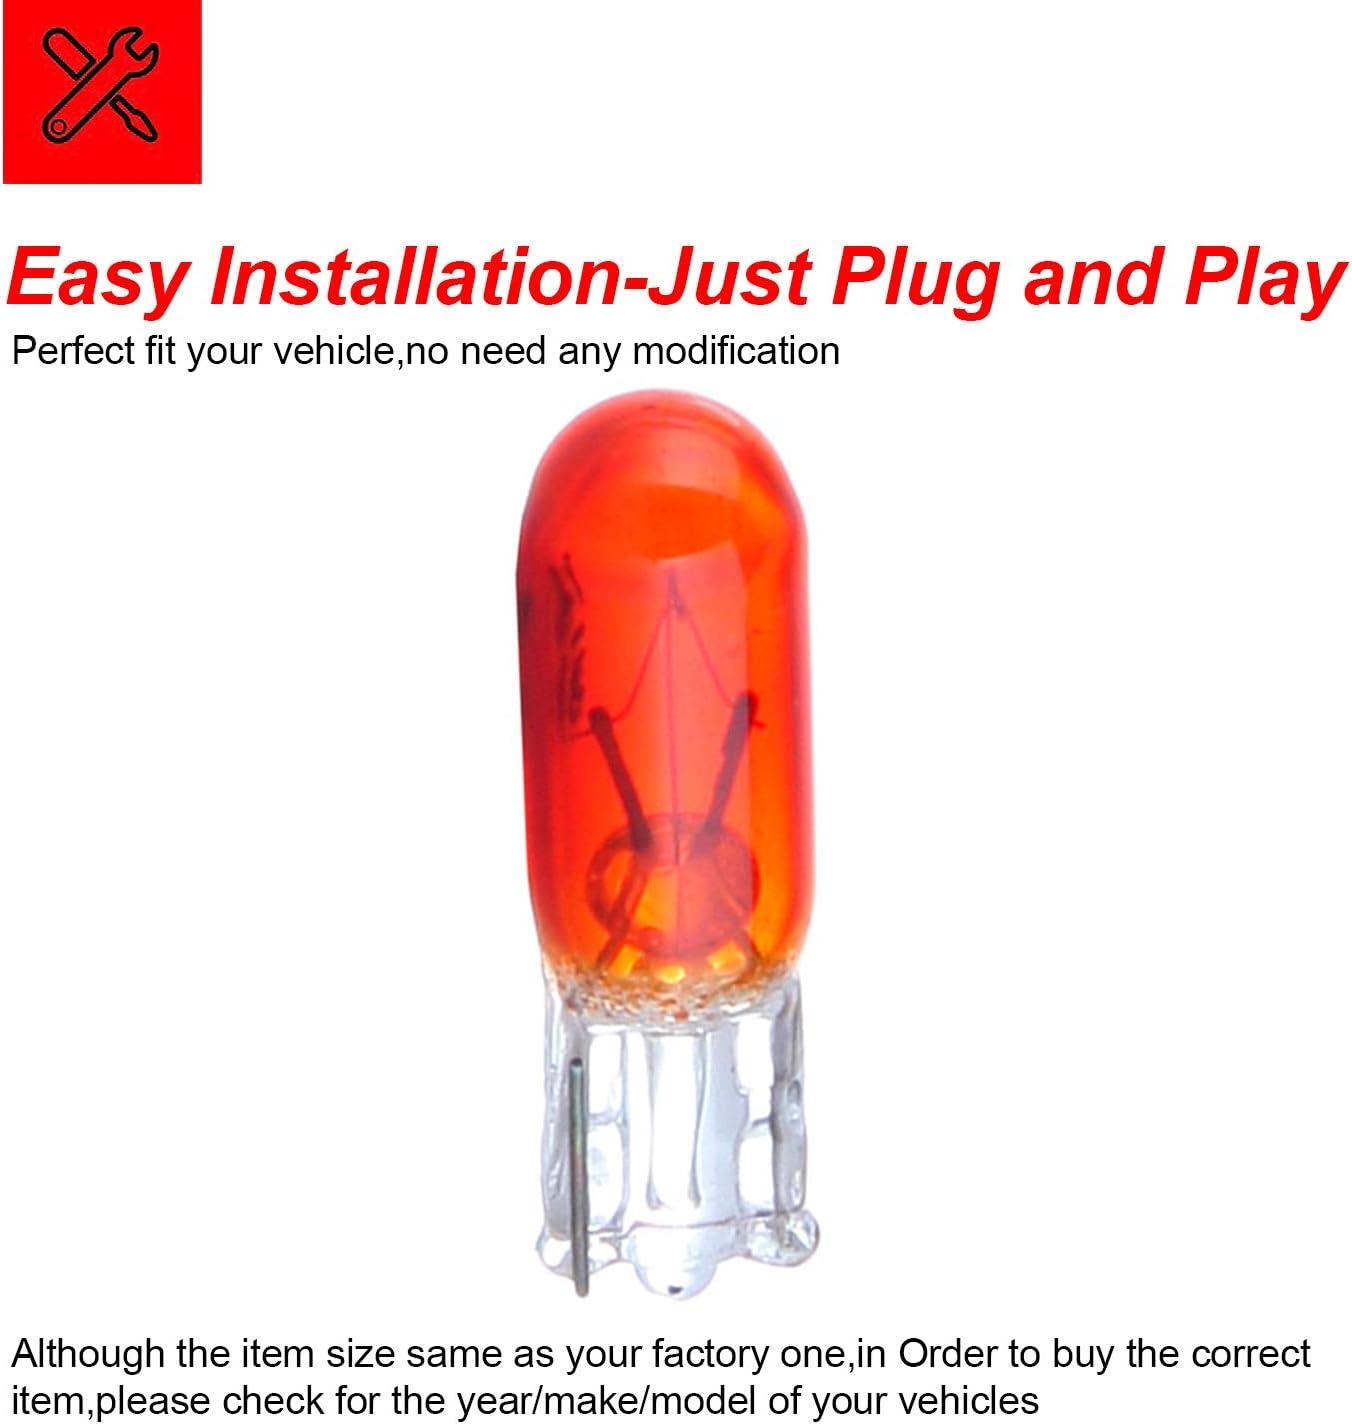 cciyu T5 74 Halogen Interior Light Bulb Instrument Cluster Gauge Dash Lamp,20 Pack yellow